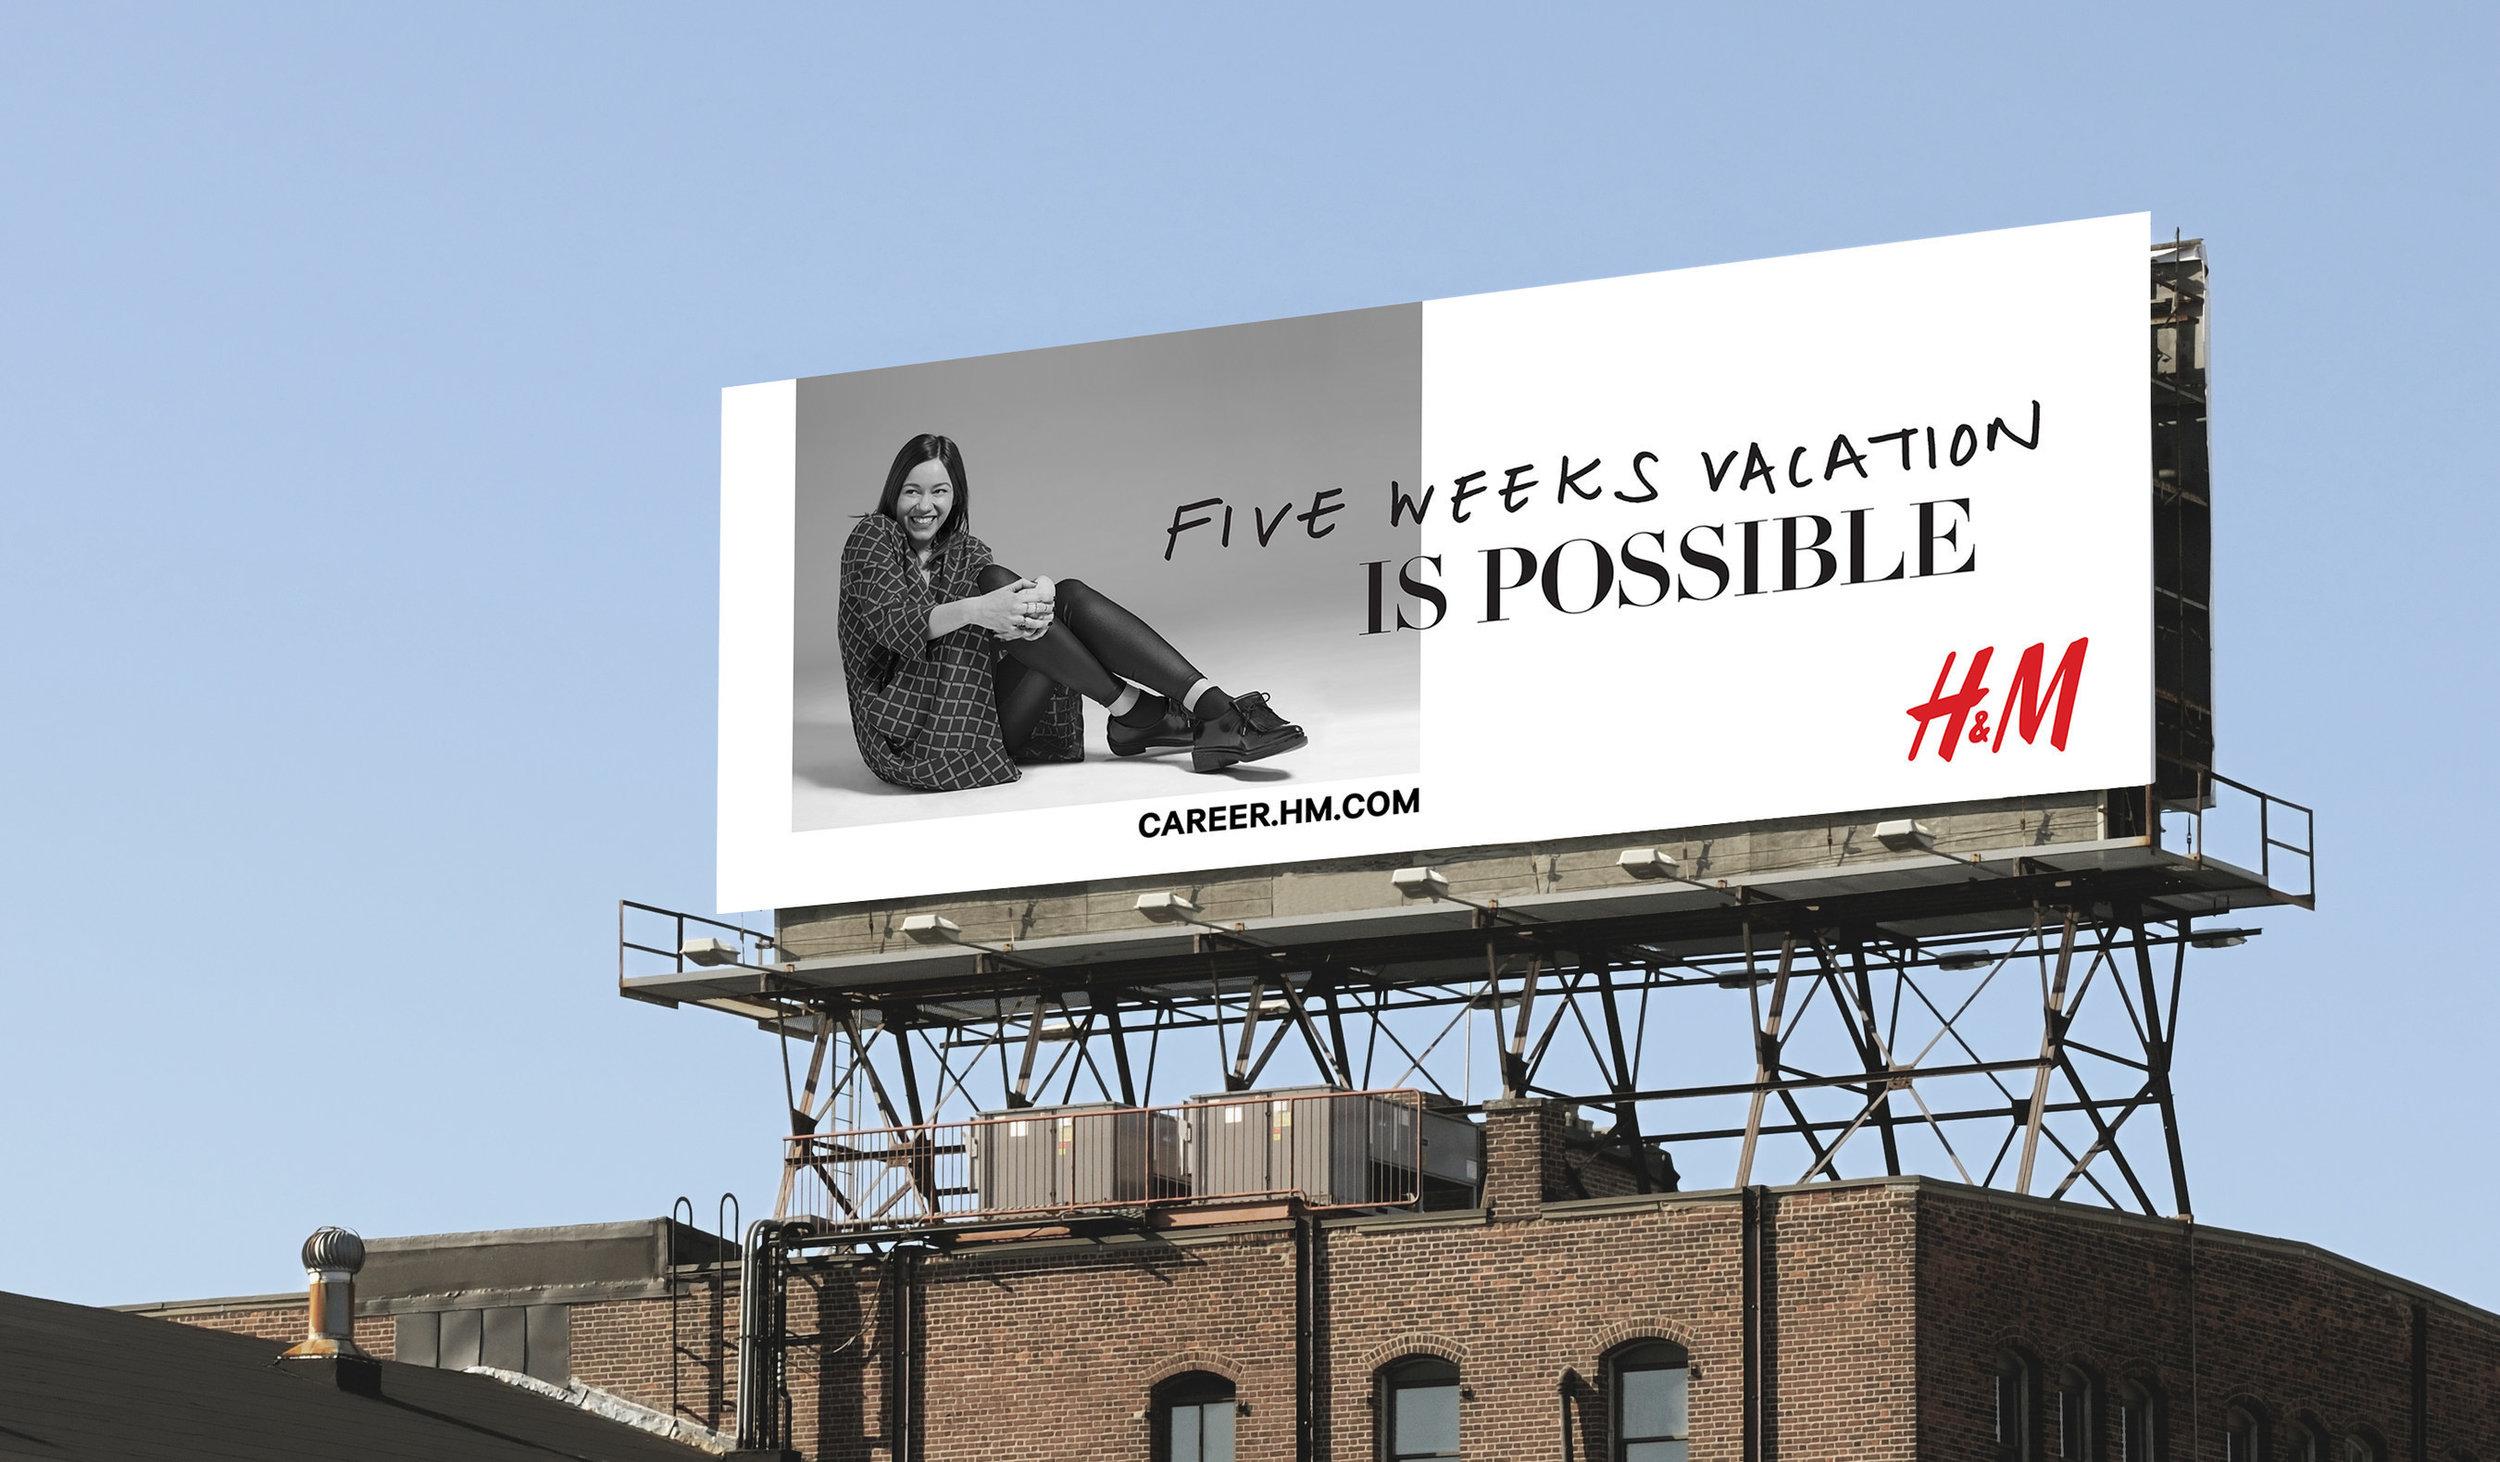 h&m-billboard